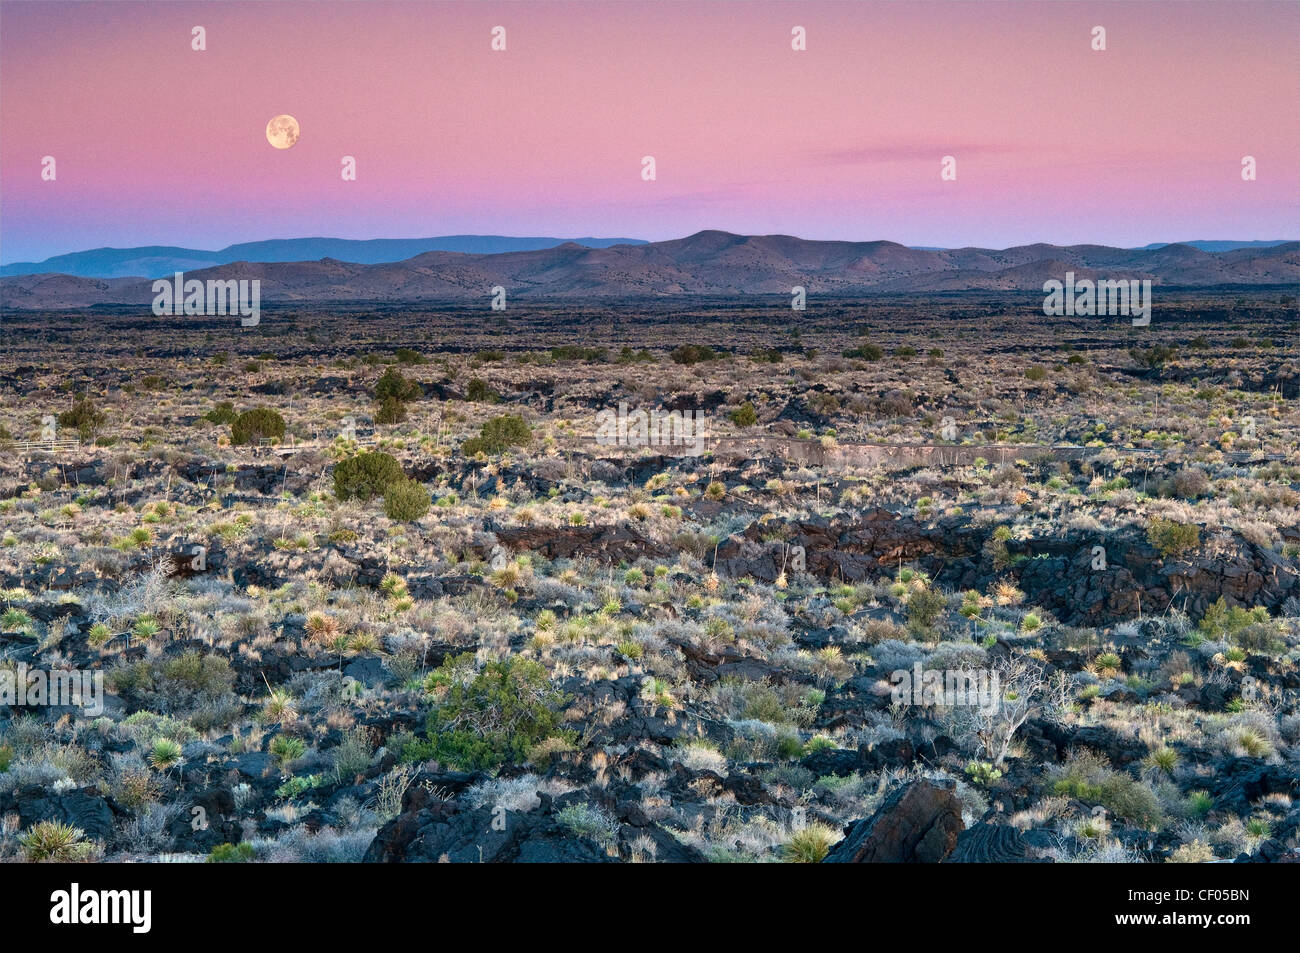 Moon setting down at sunrise over Carrizozo Malpais lava field, Valley of Fires, near Carrizozo, New Mexico, USA - Stock Image